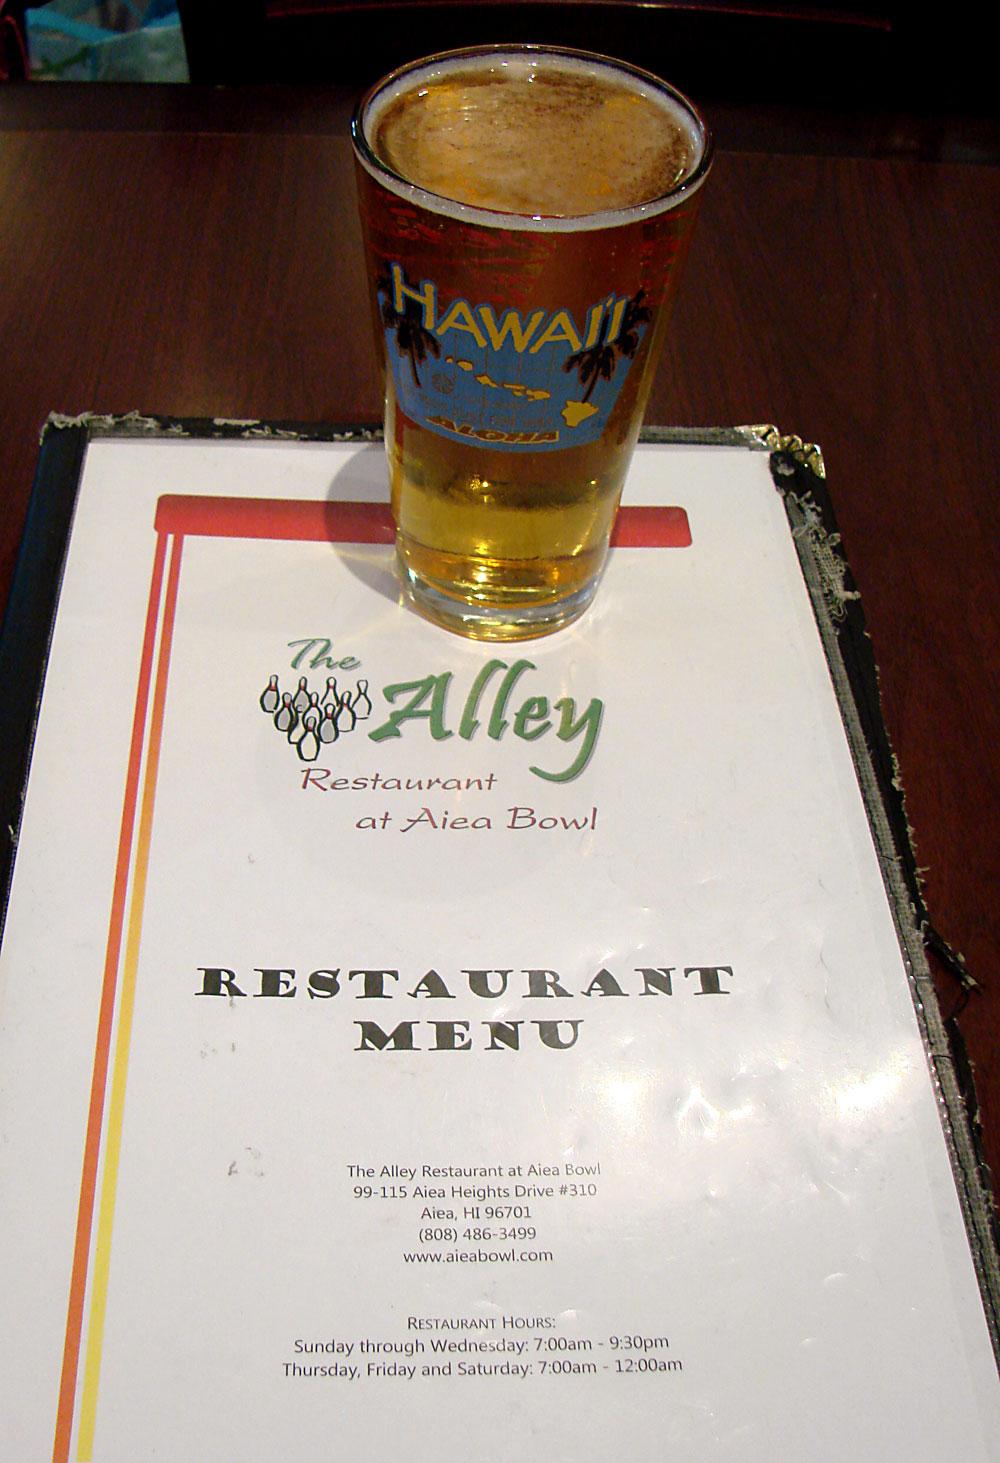 The Alley Restaurant at Aiea Bowl – Tasty Island